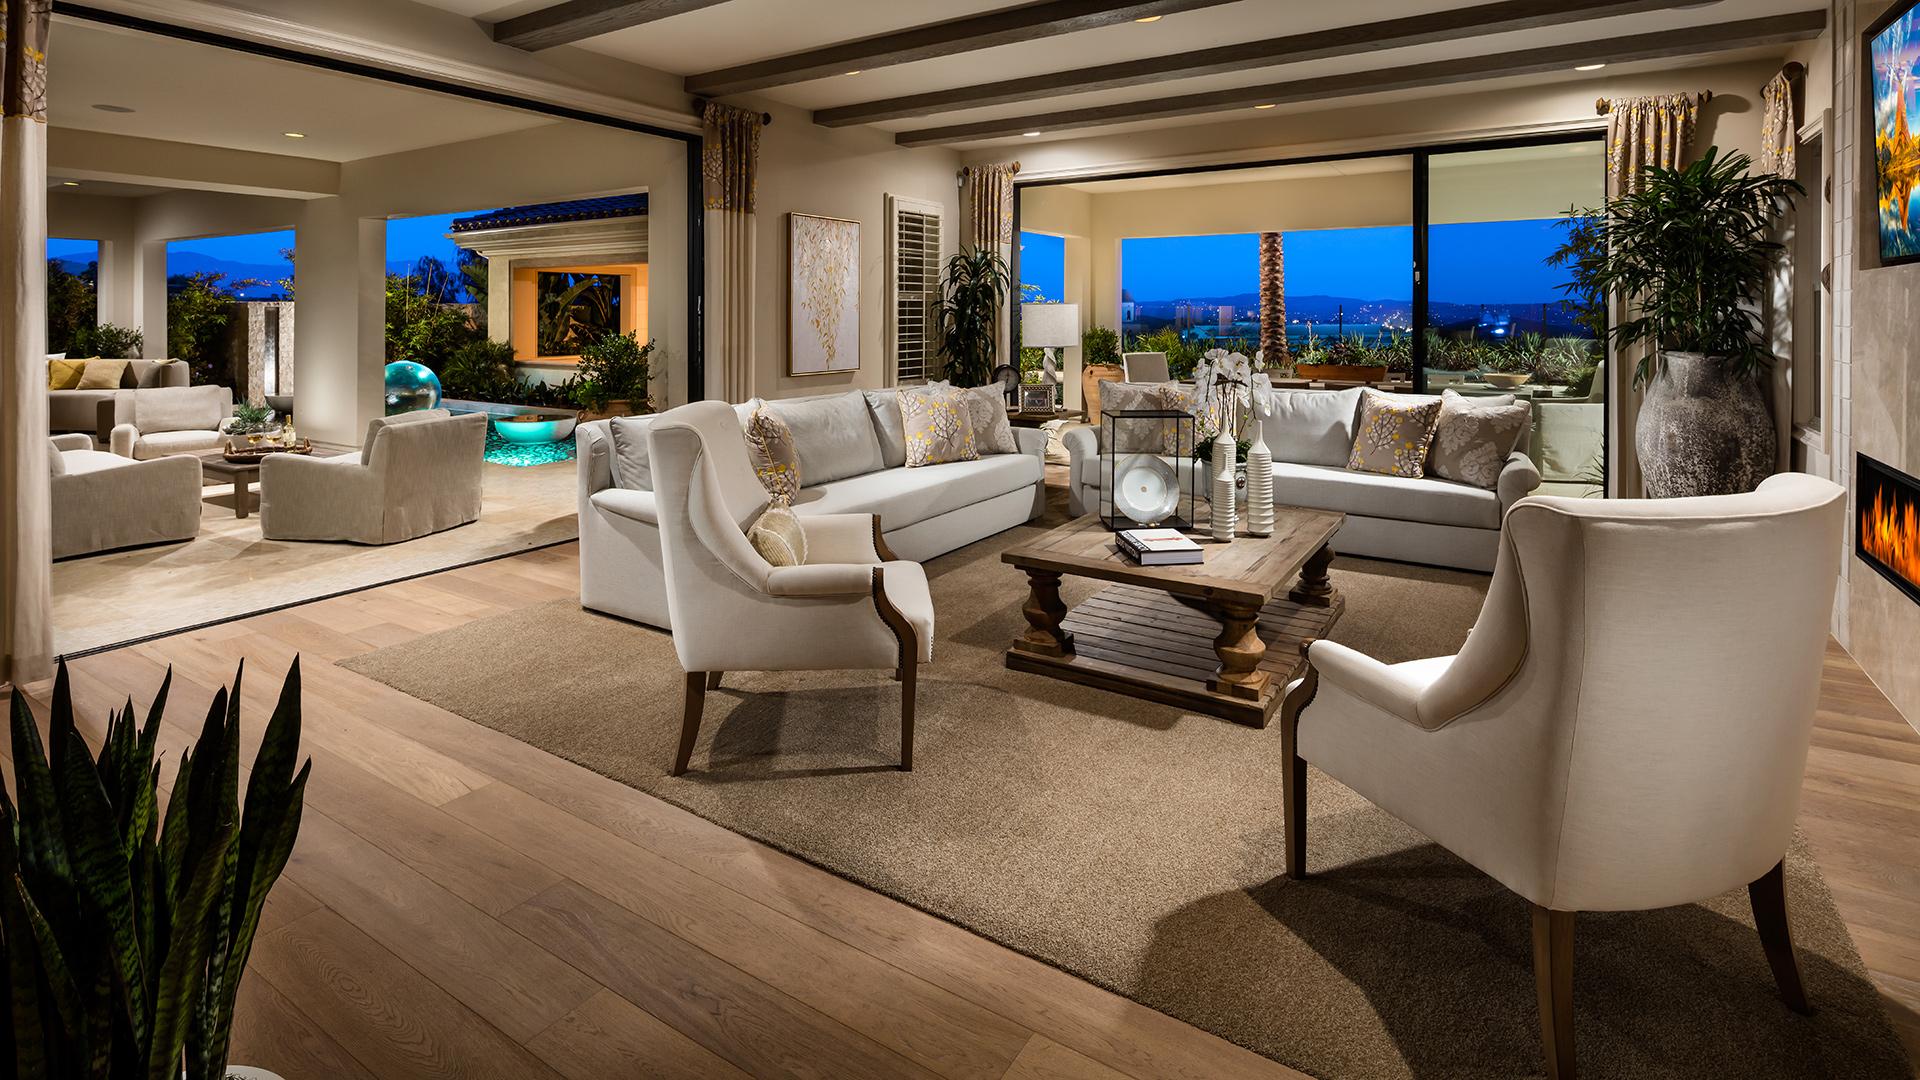 Enclave at yorba linda the santa rosa ca home design for Interior design license california